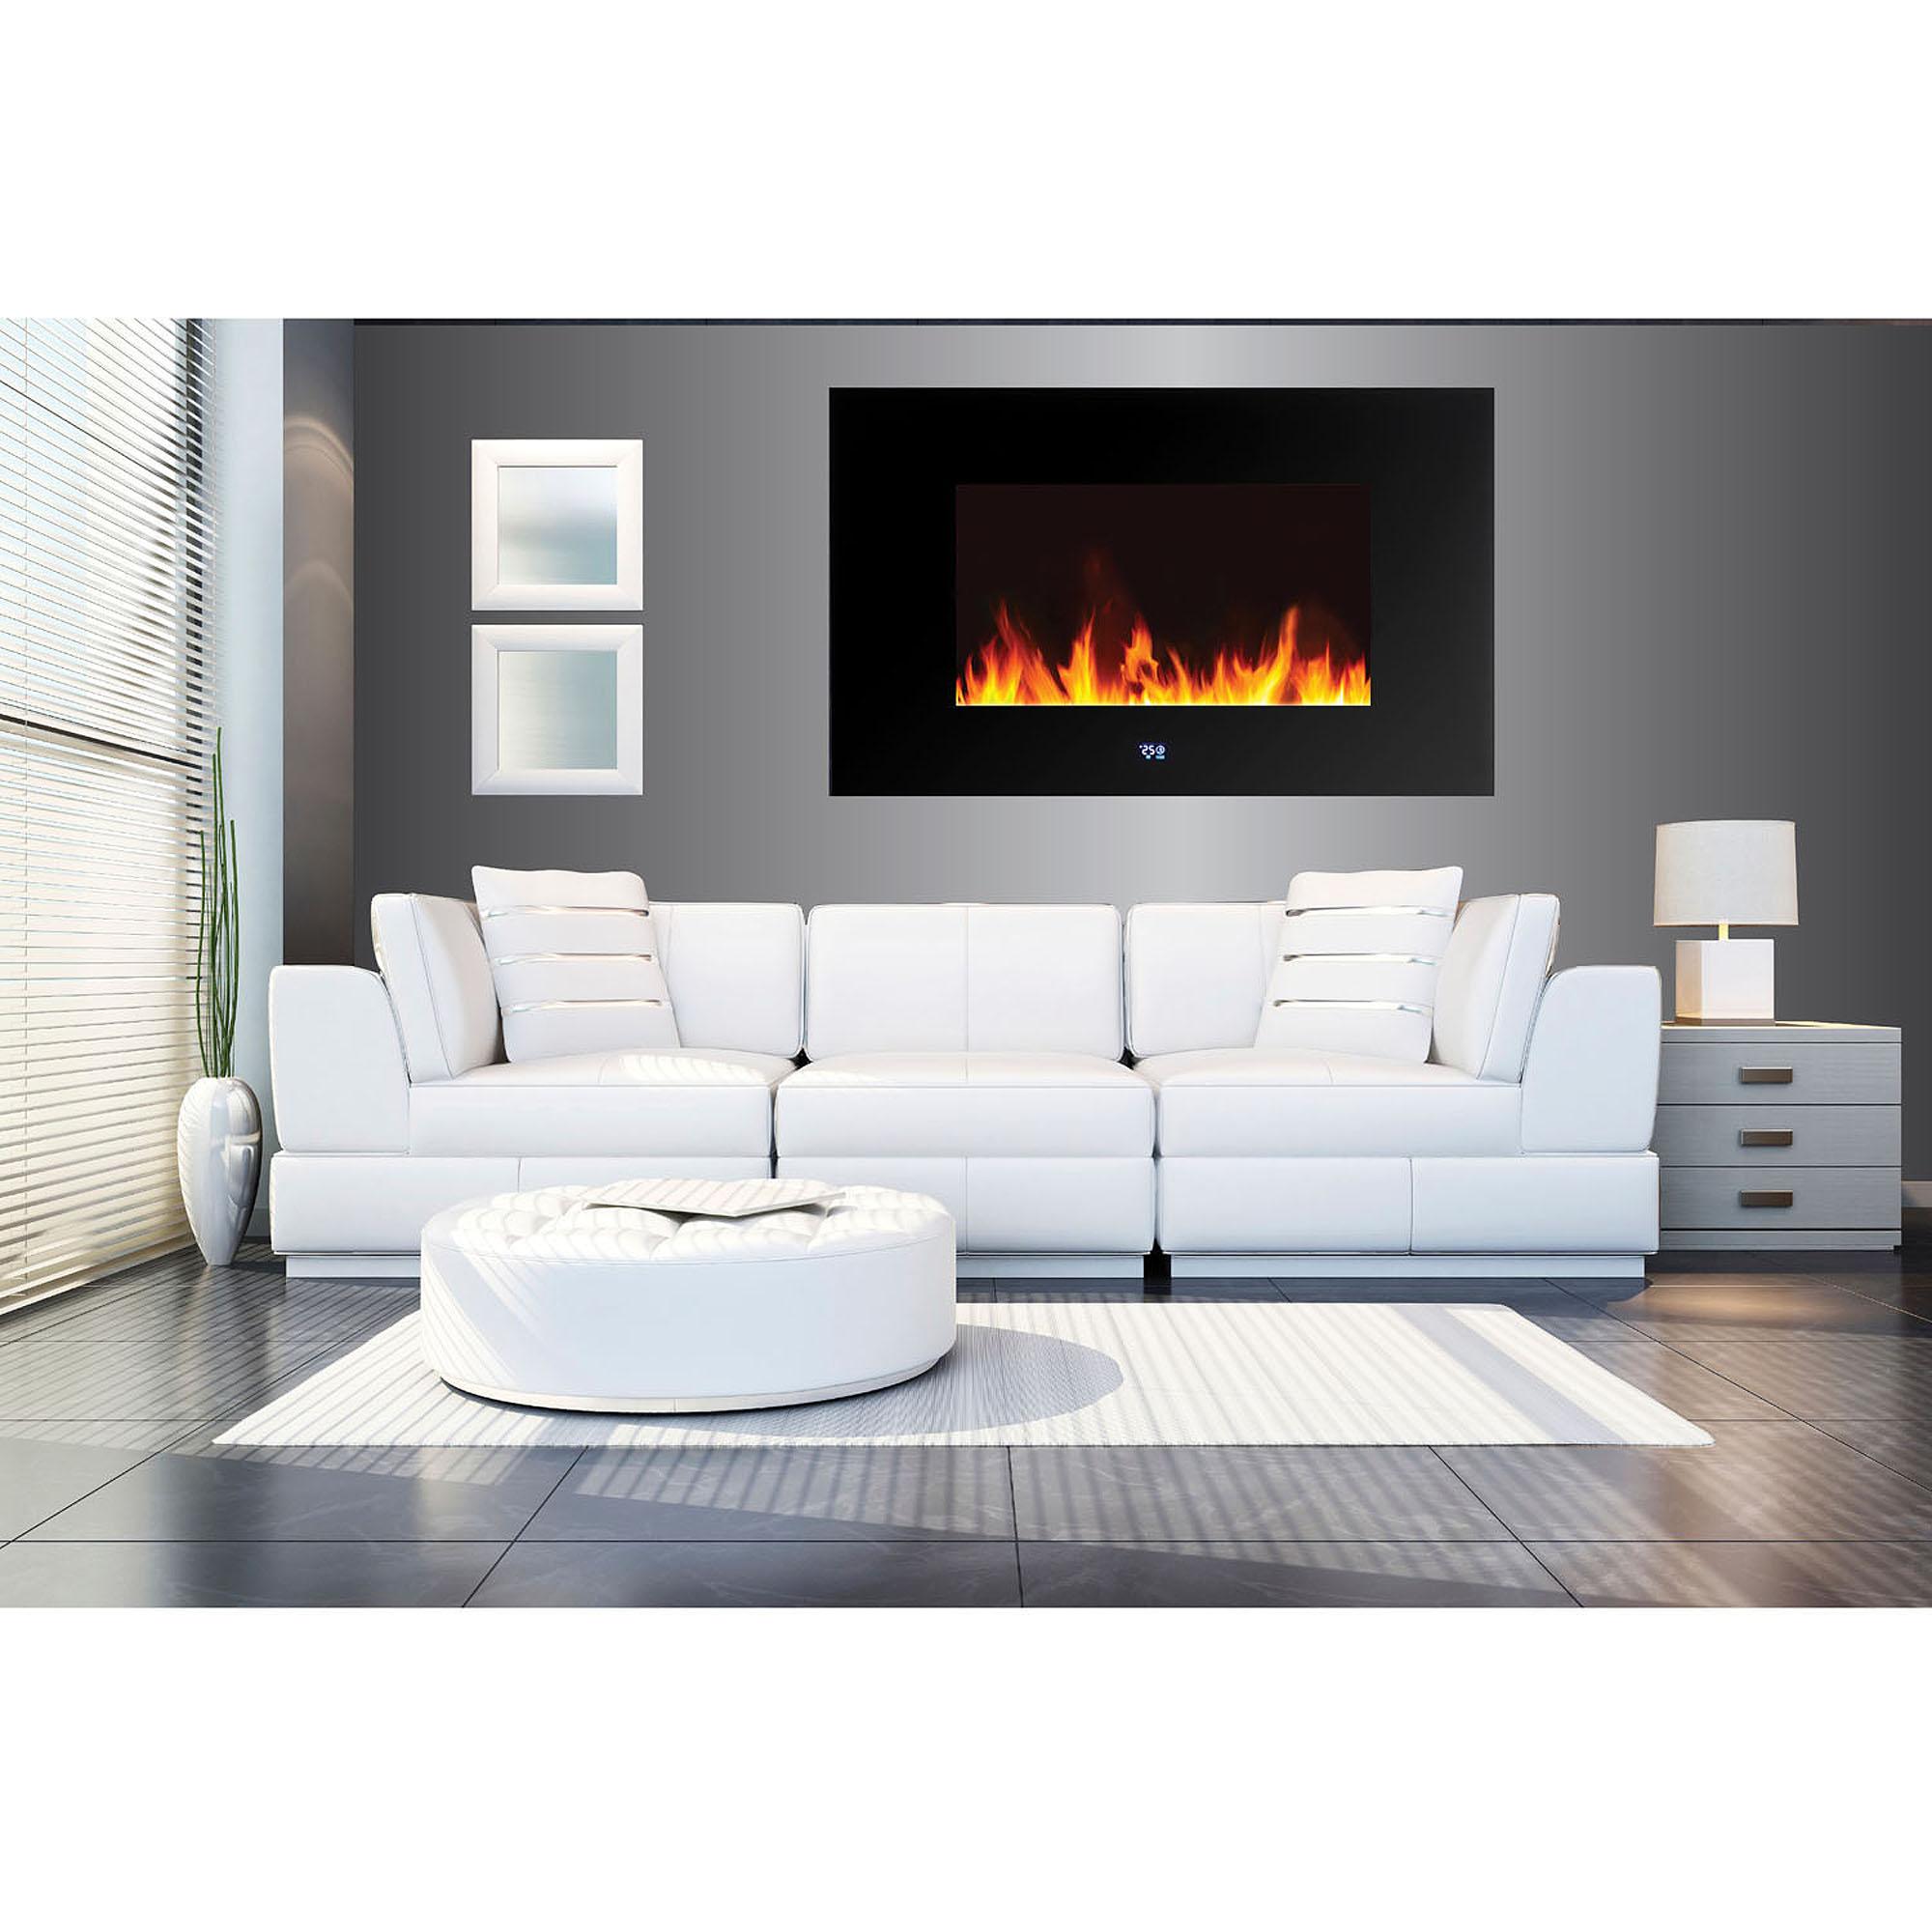 Warm House Wlvf 10343 Venice Horizontal Wall Mounted Led Fireplace